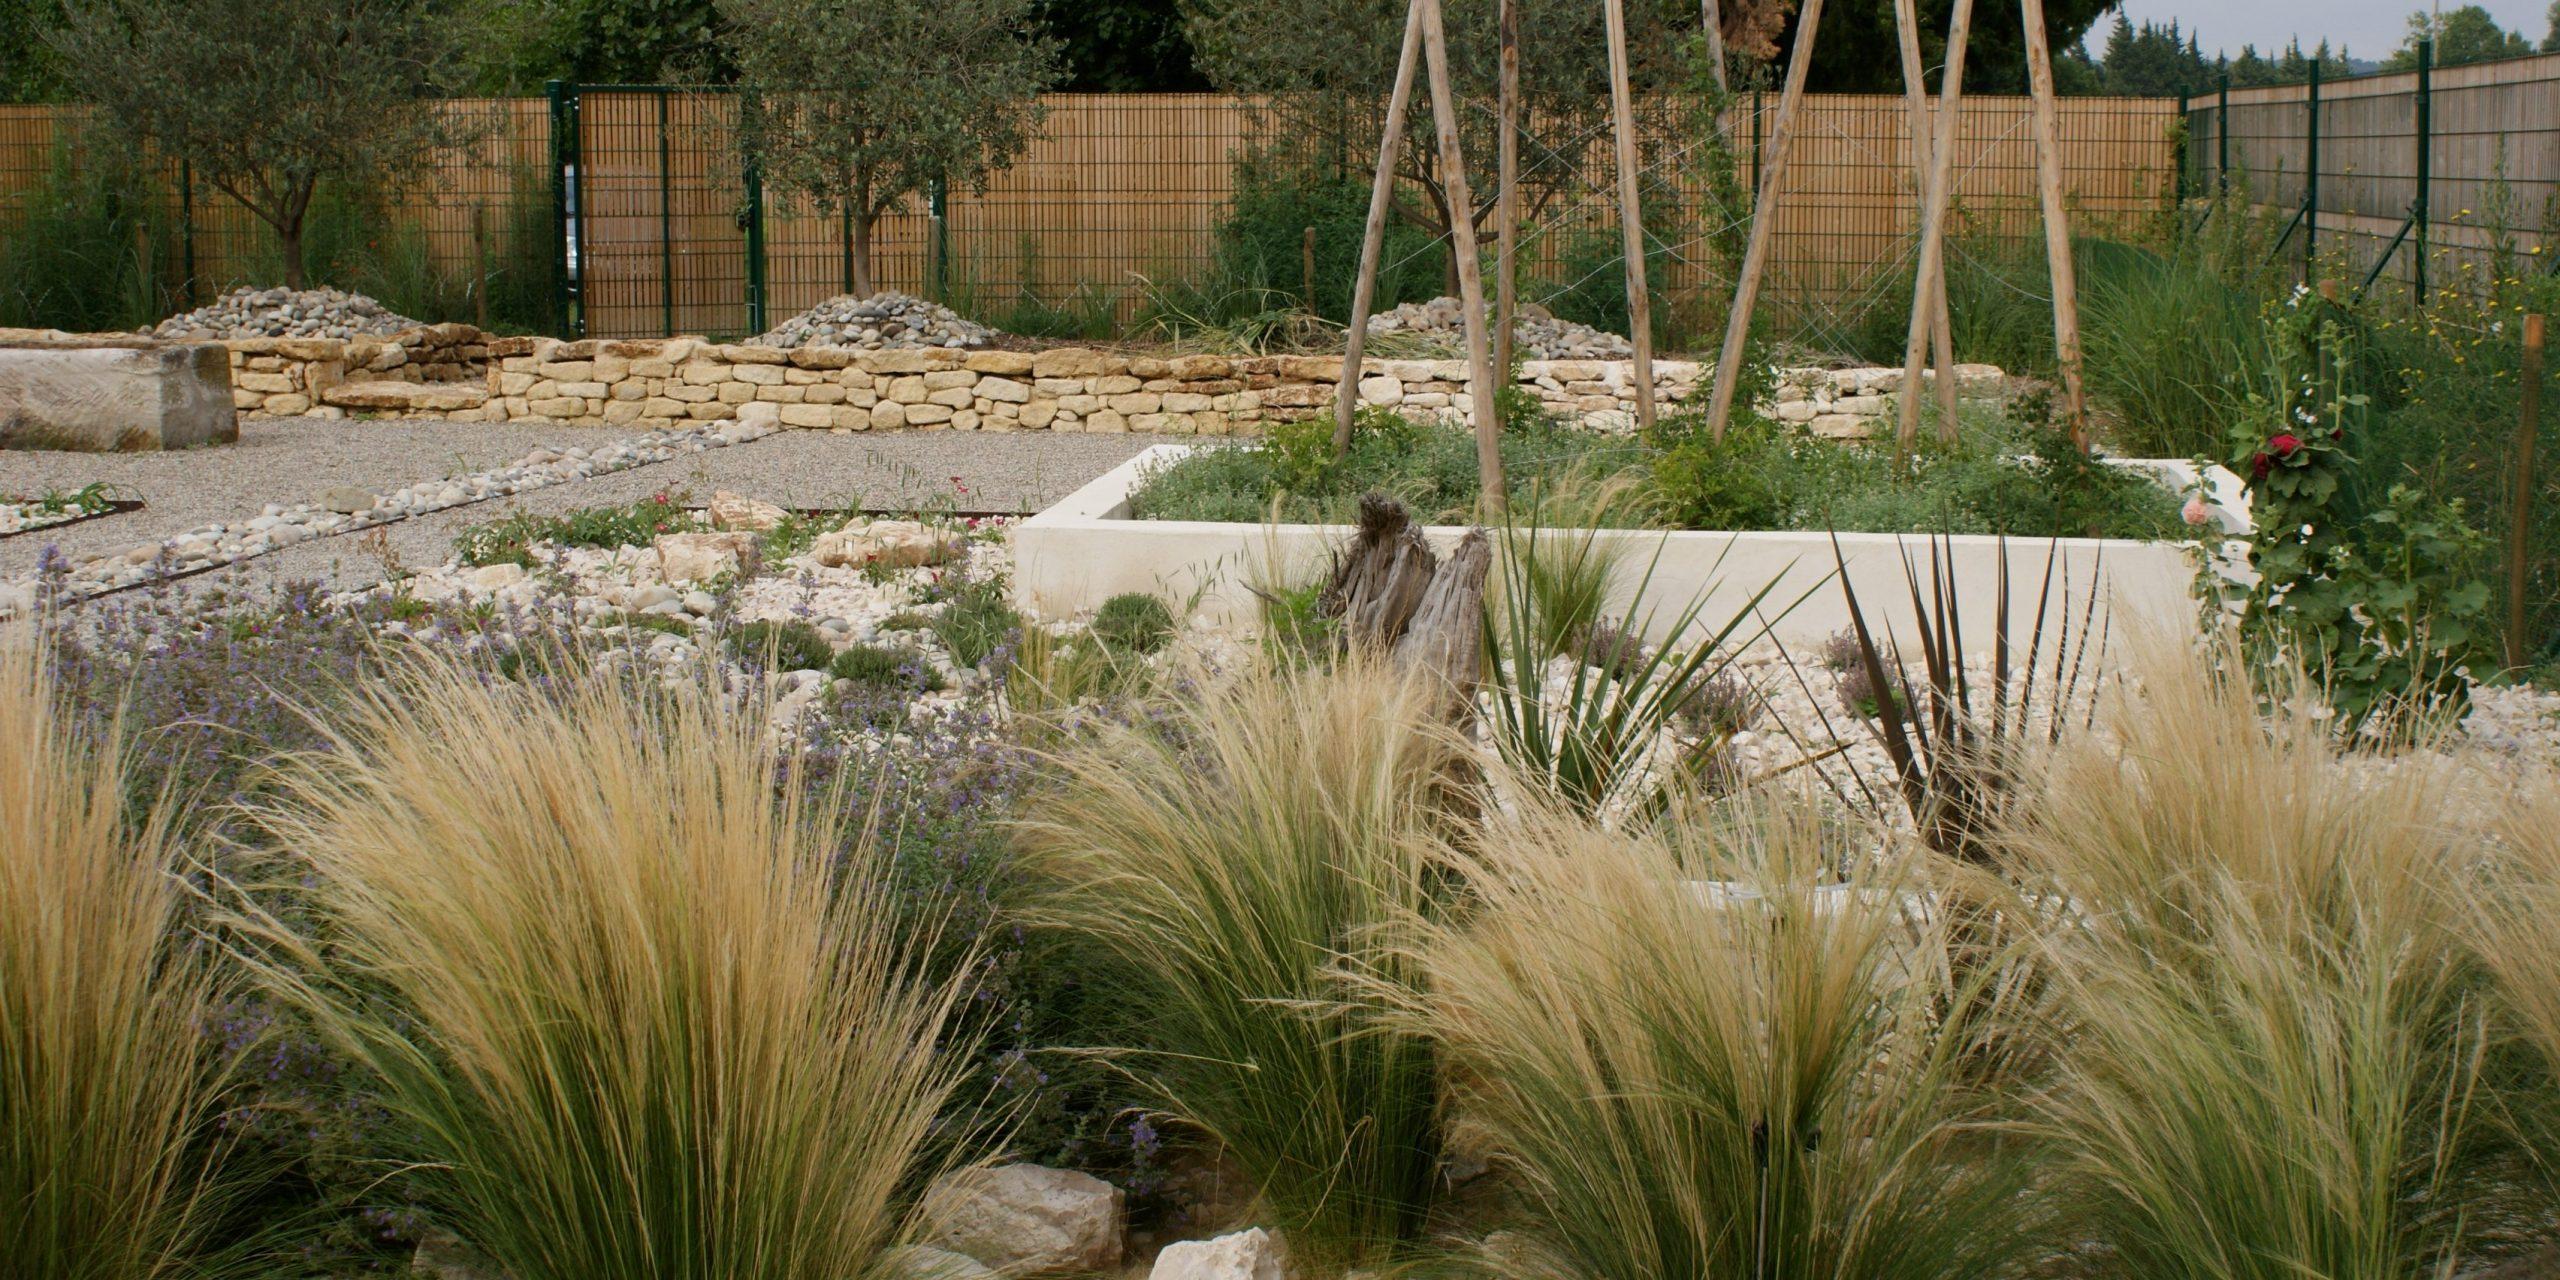 Les Jardins Secs Méditerranéens - Paysagiste Marseille, Aix ... intérieur Amenagement Jardin Avec Graminees